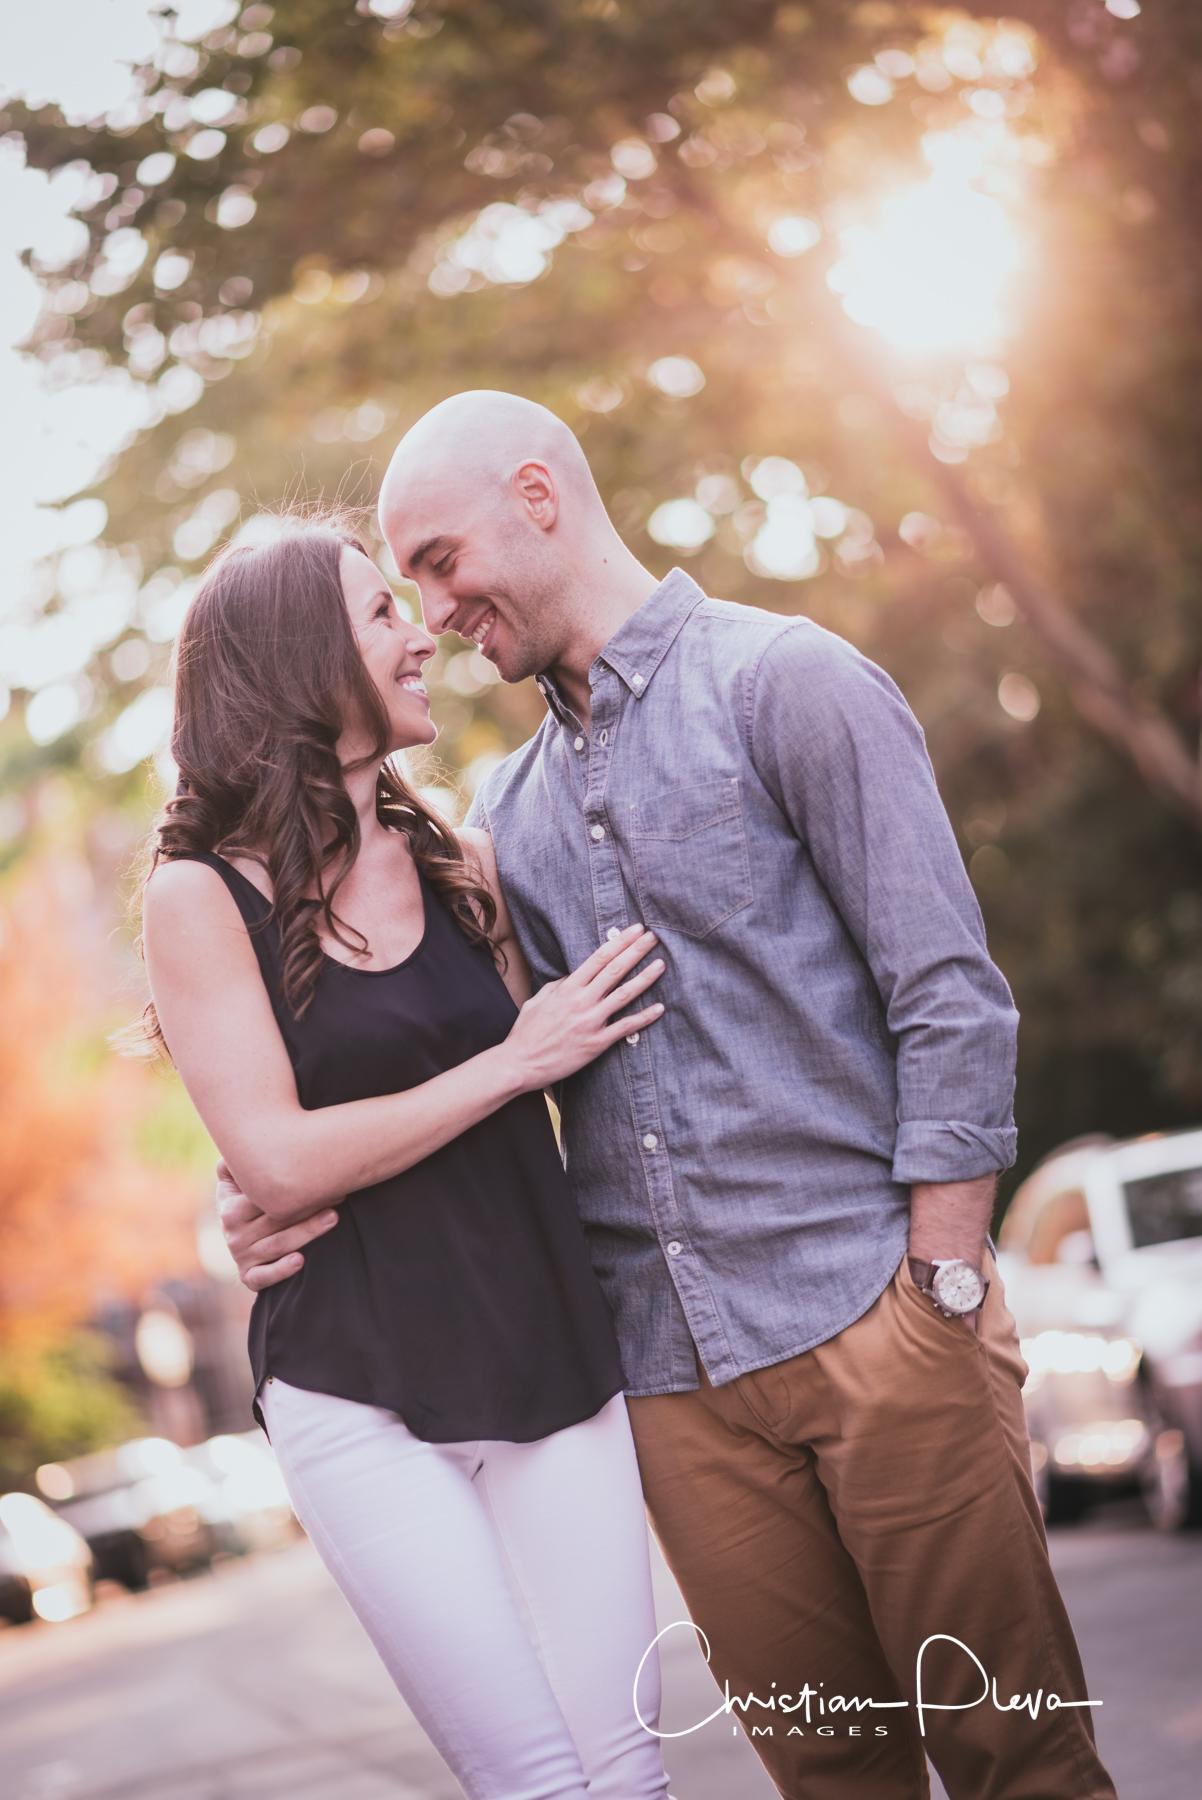 Boston Engagement Photography DM-1.jpg